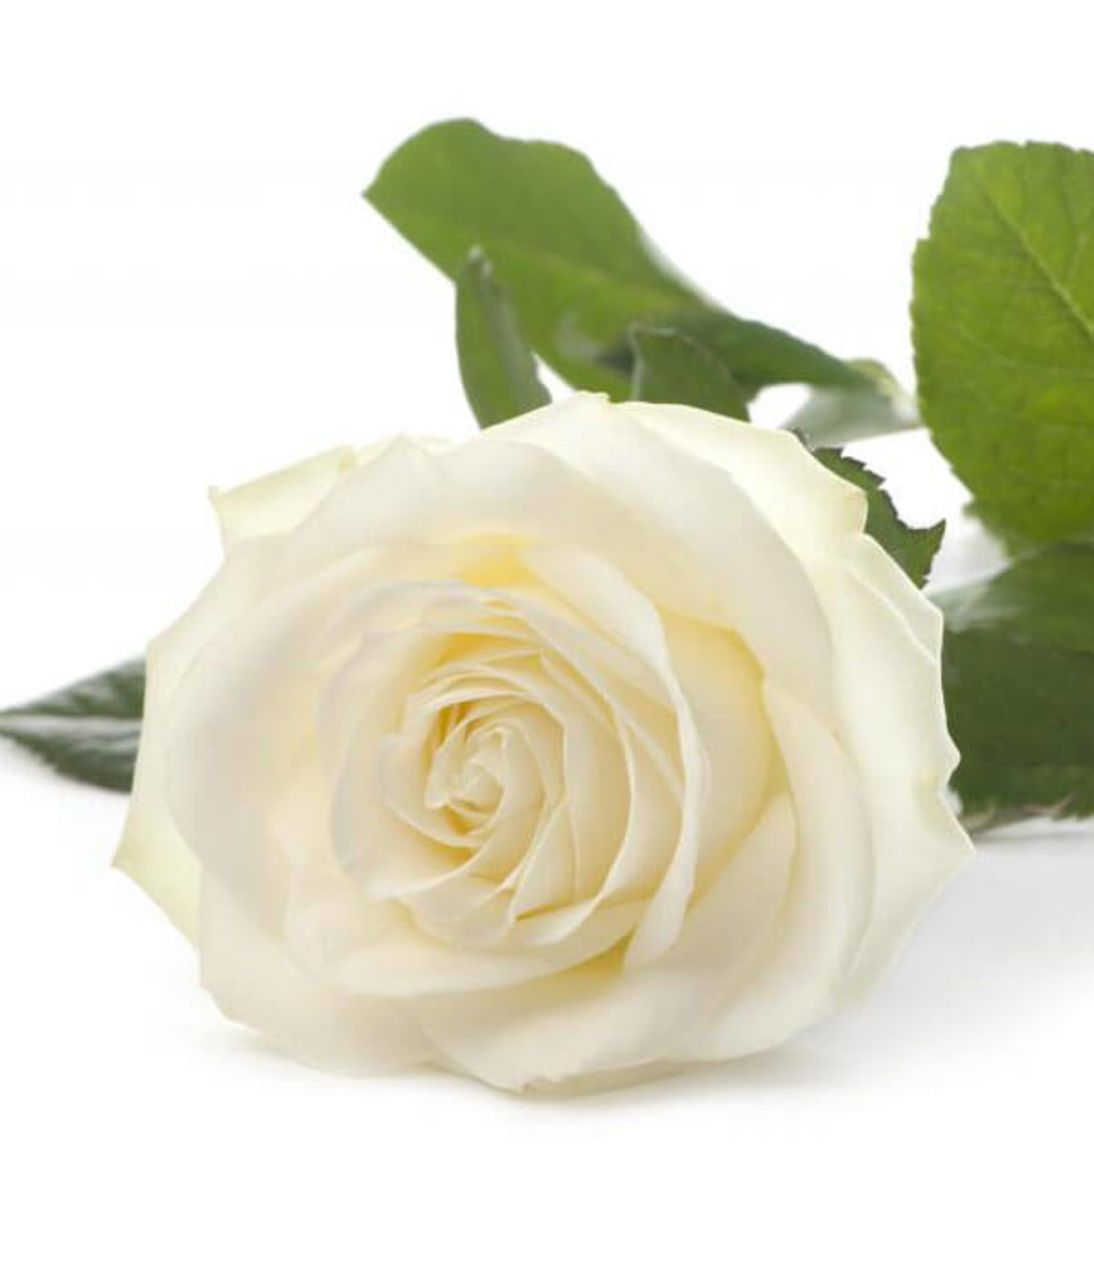 Біла троянда поштучно. Superflowers.com.ua